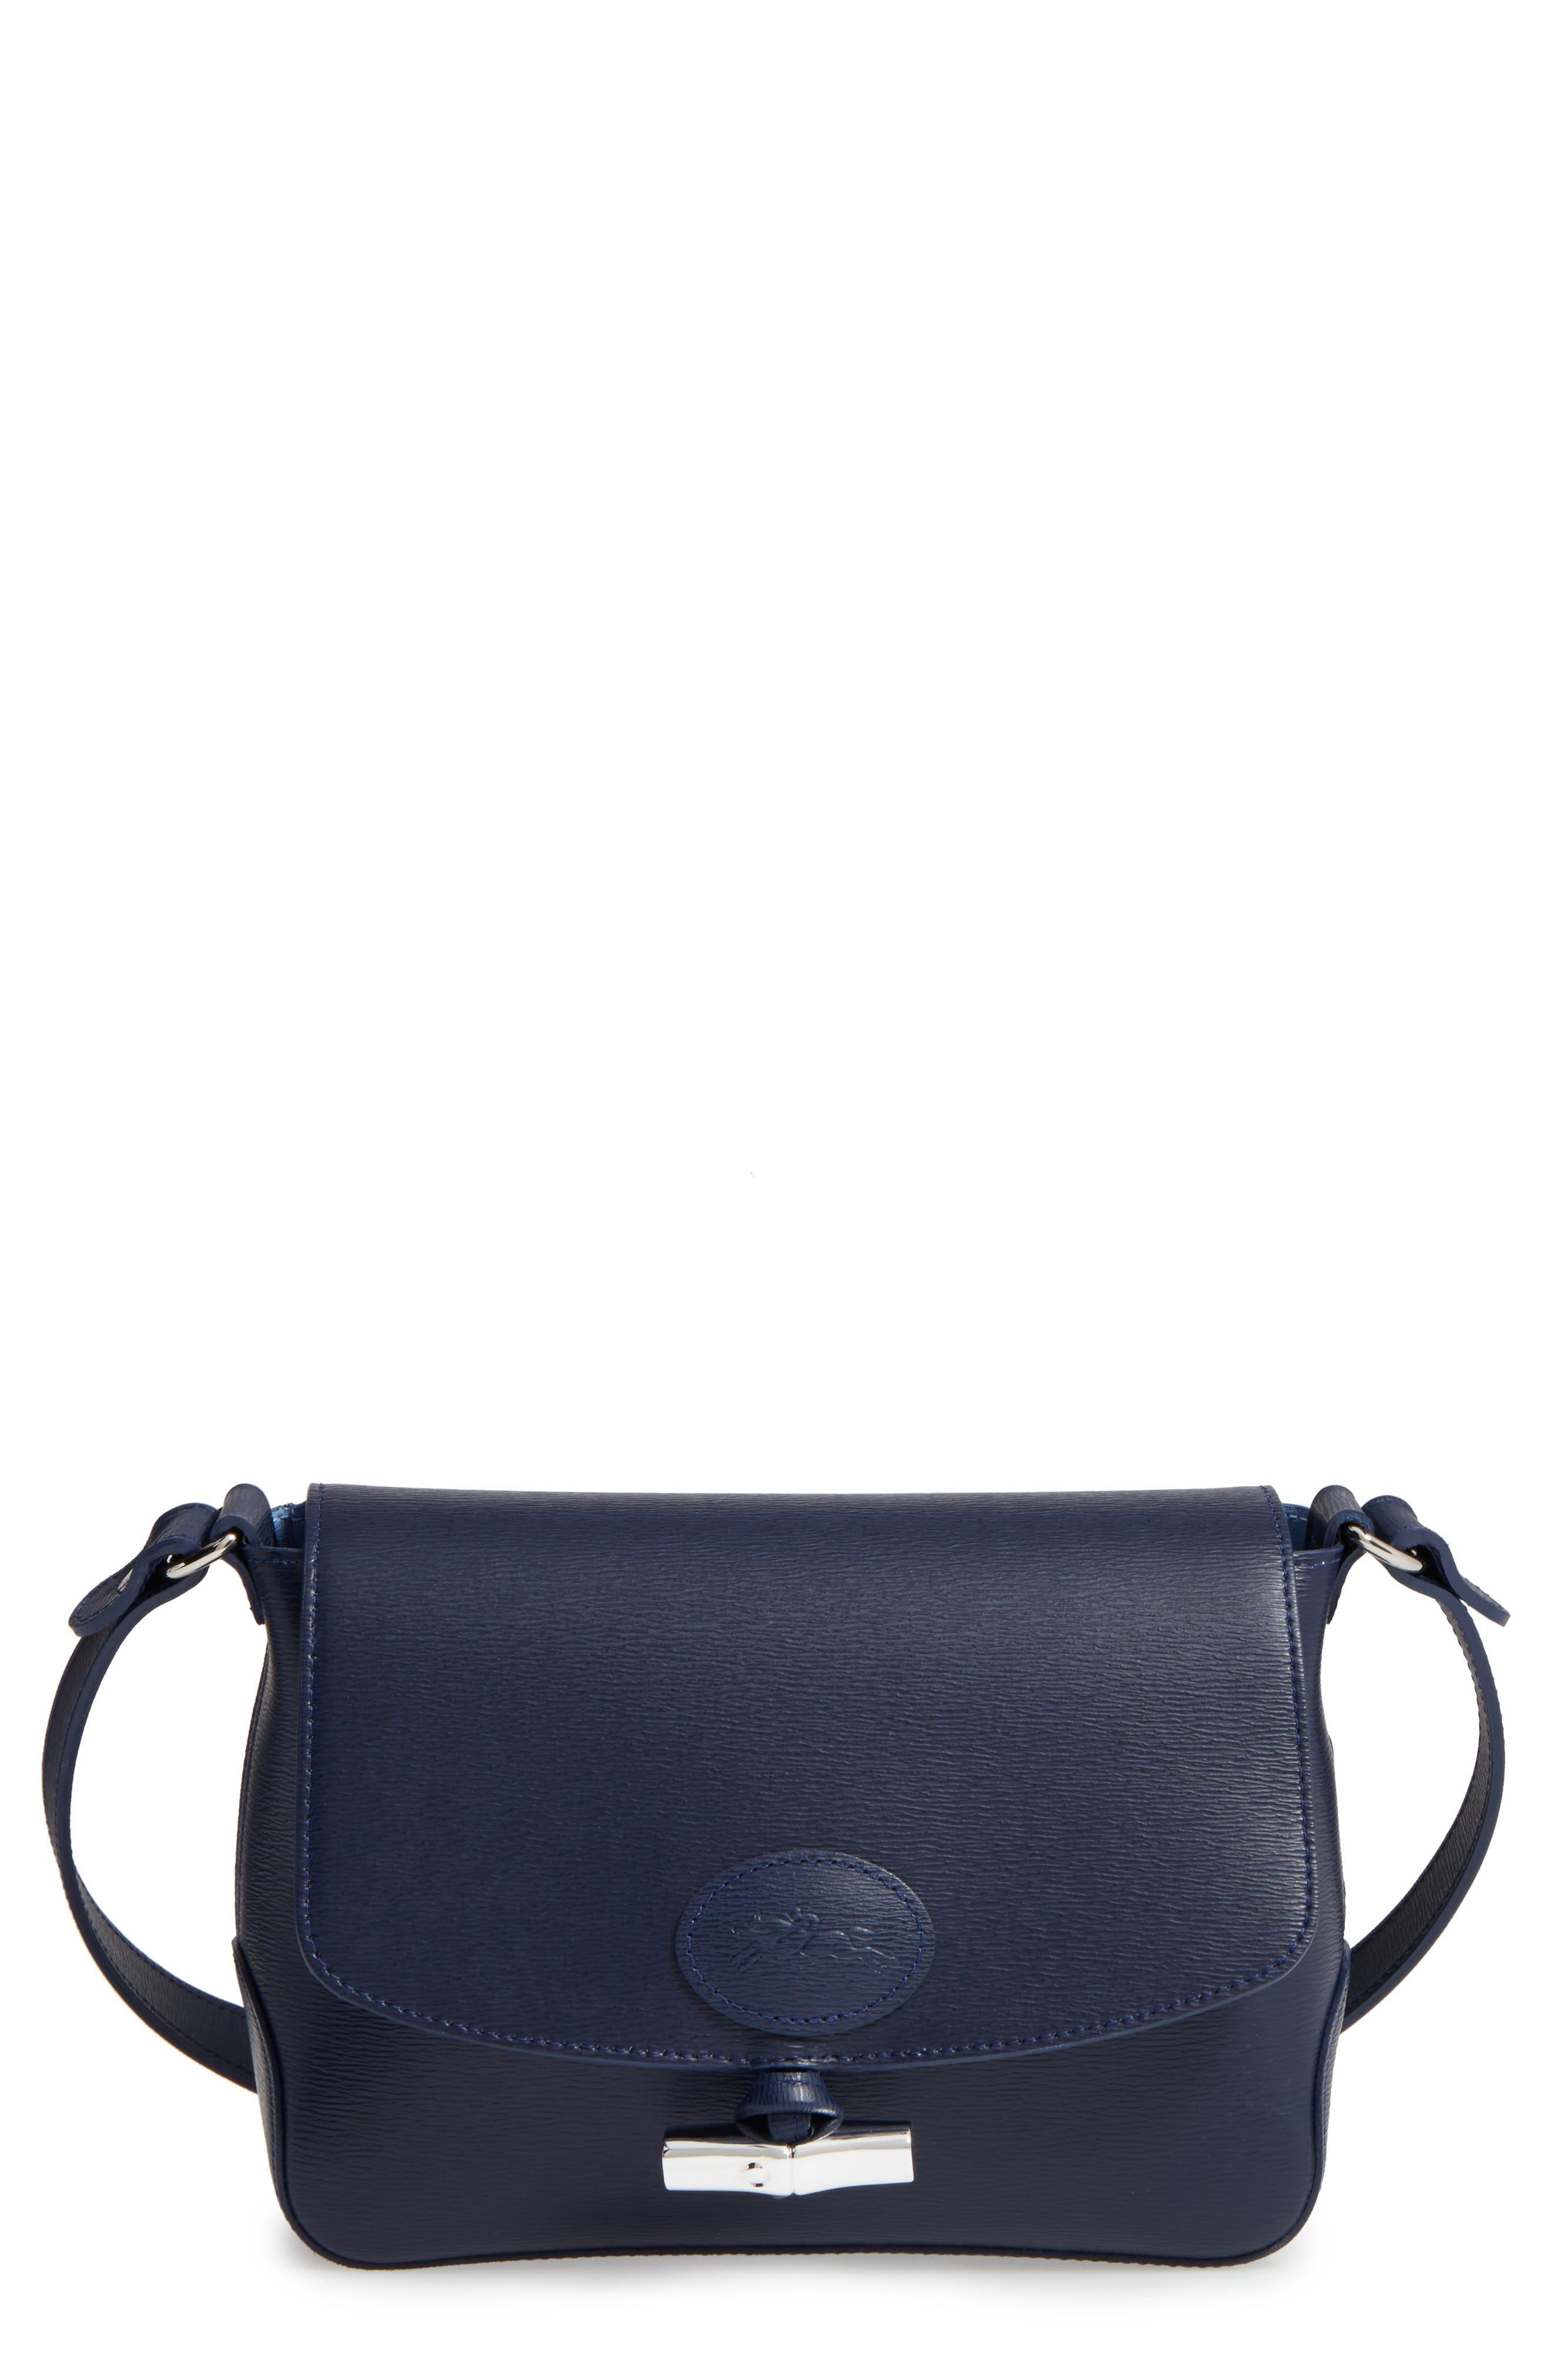 Roseau Leather Crossbody Bag,                         Main,                         color, Navy